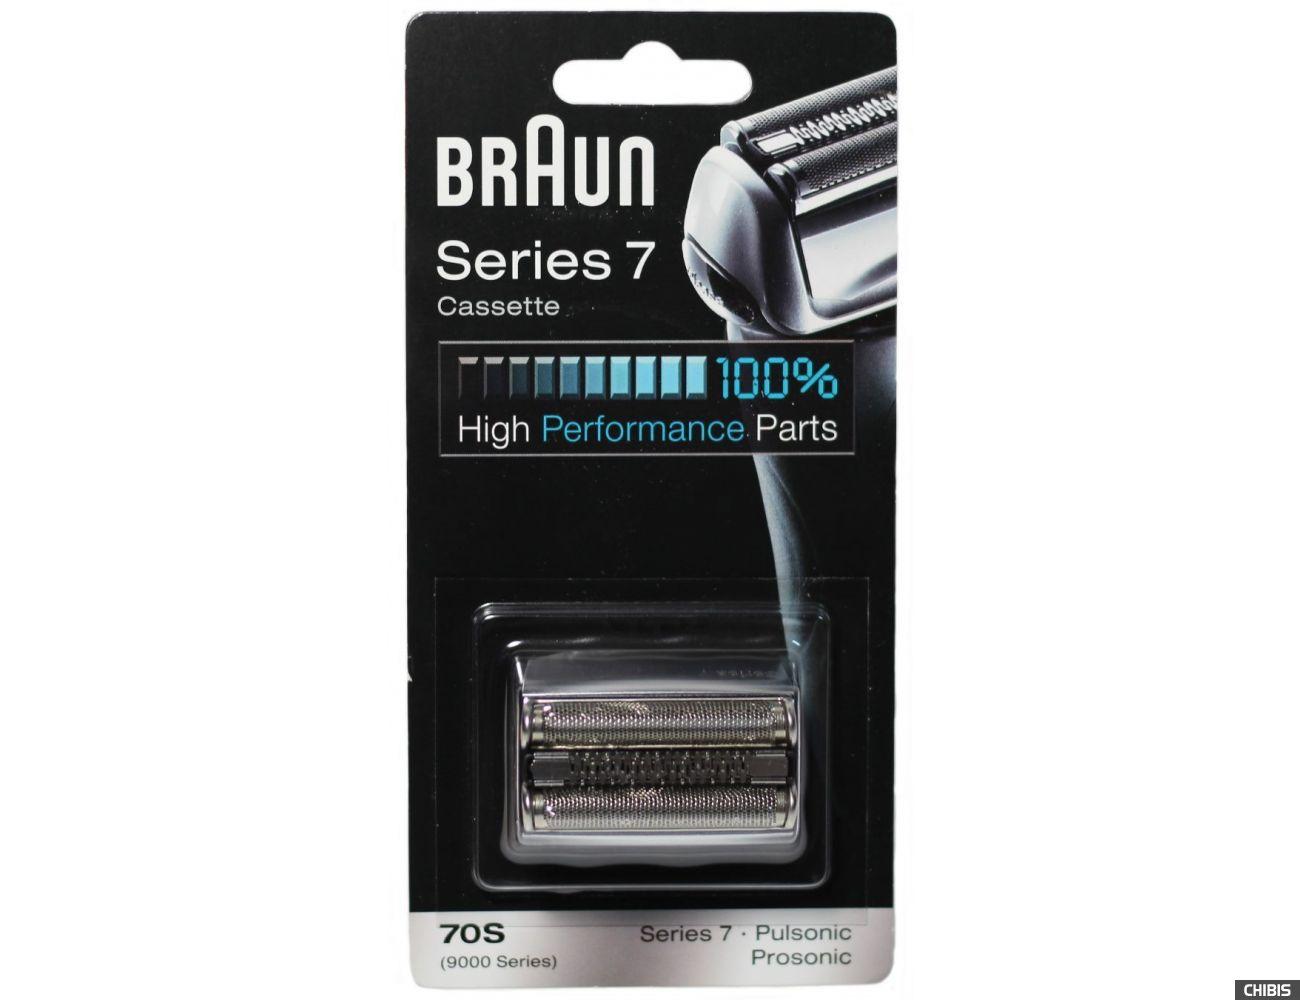 Сетка Braun 70S для бритв серии 9000 7 Пульсоник оригинал Германия